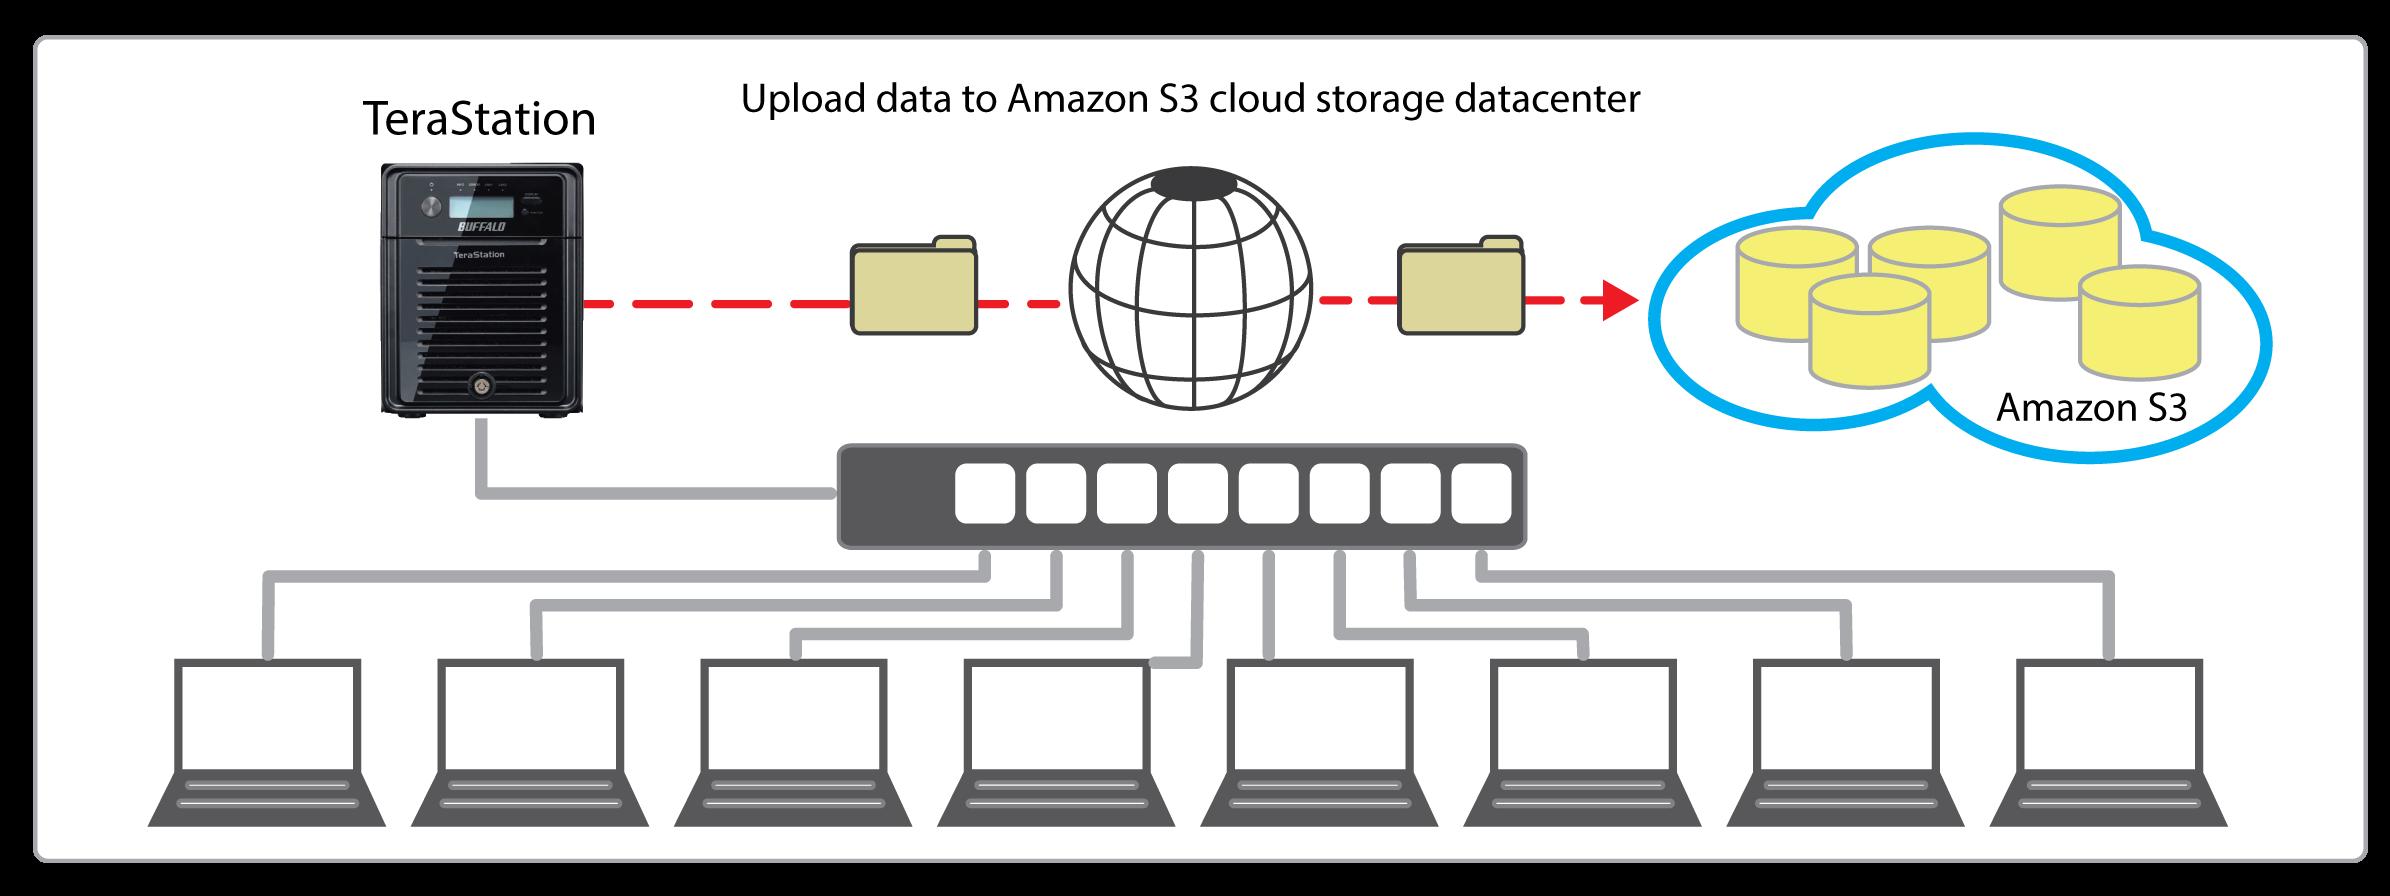 terastation 3000 cloud storage backup